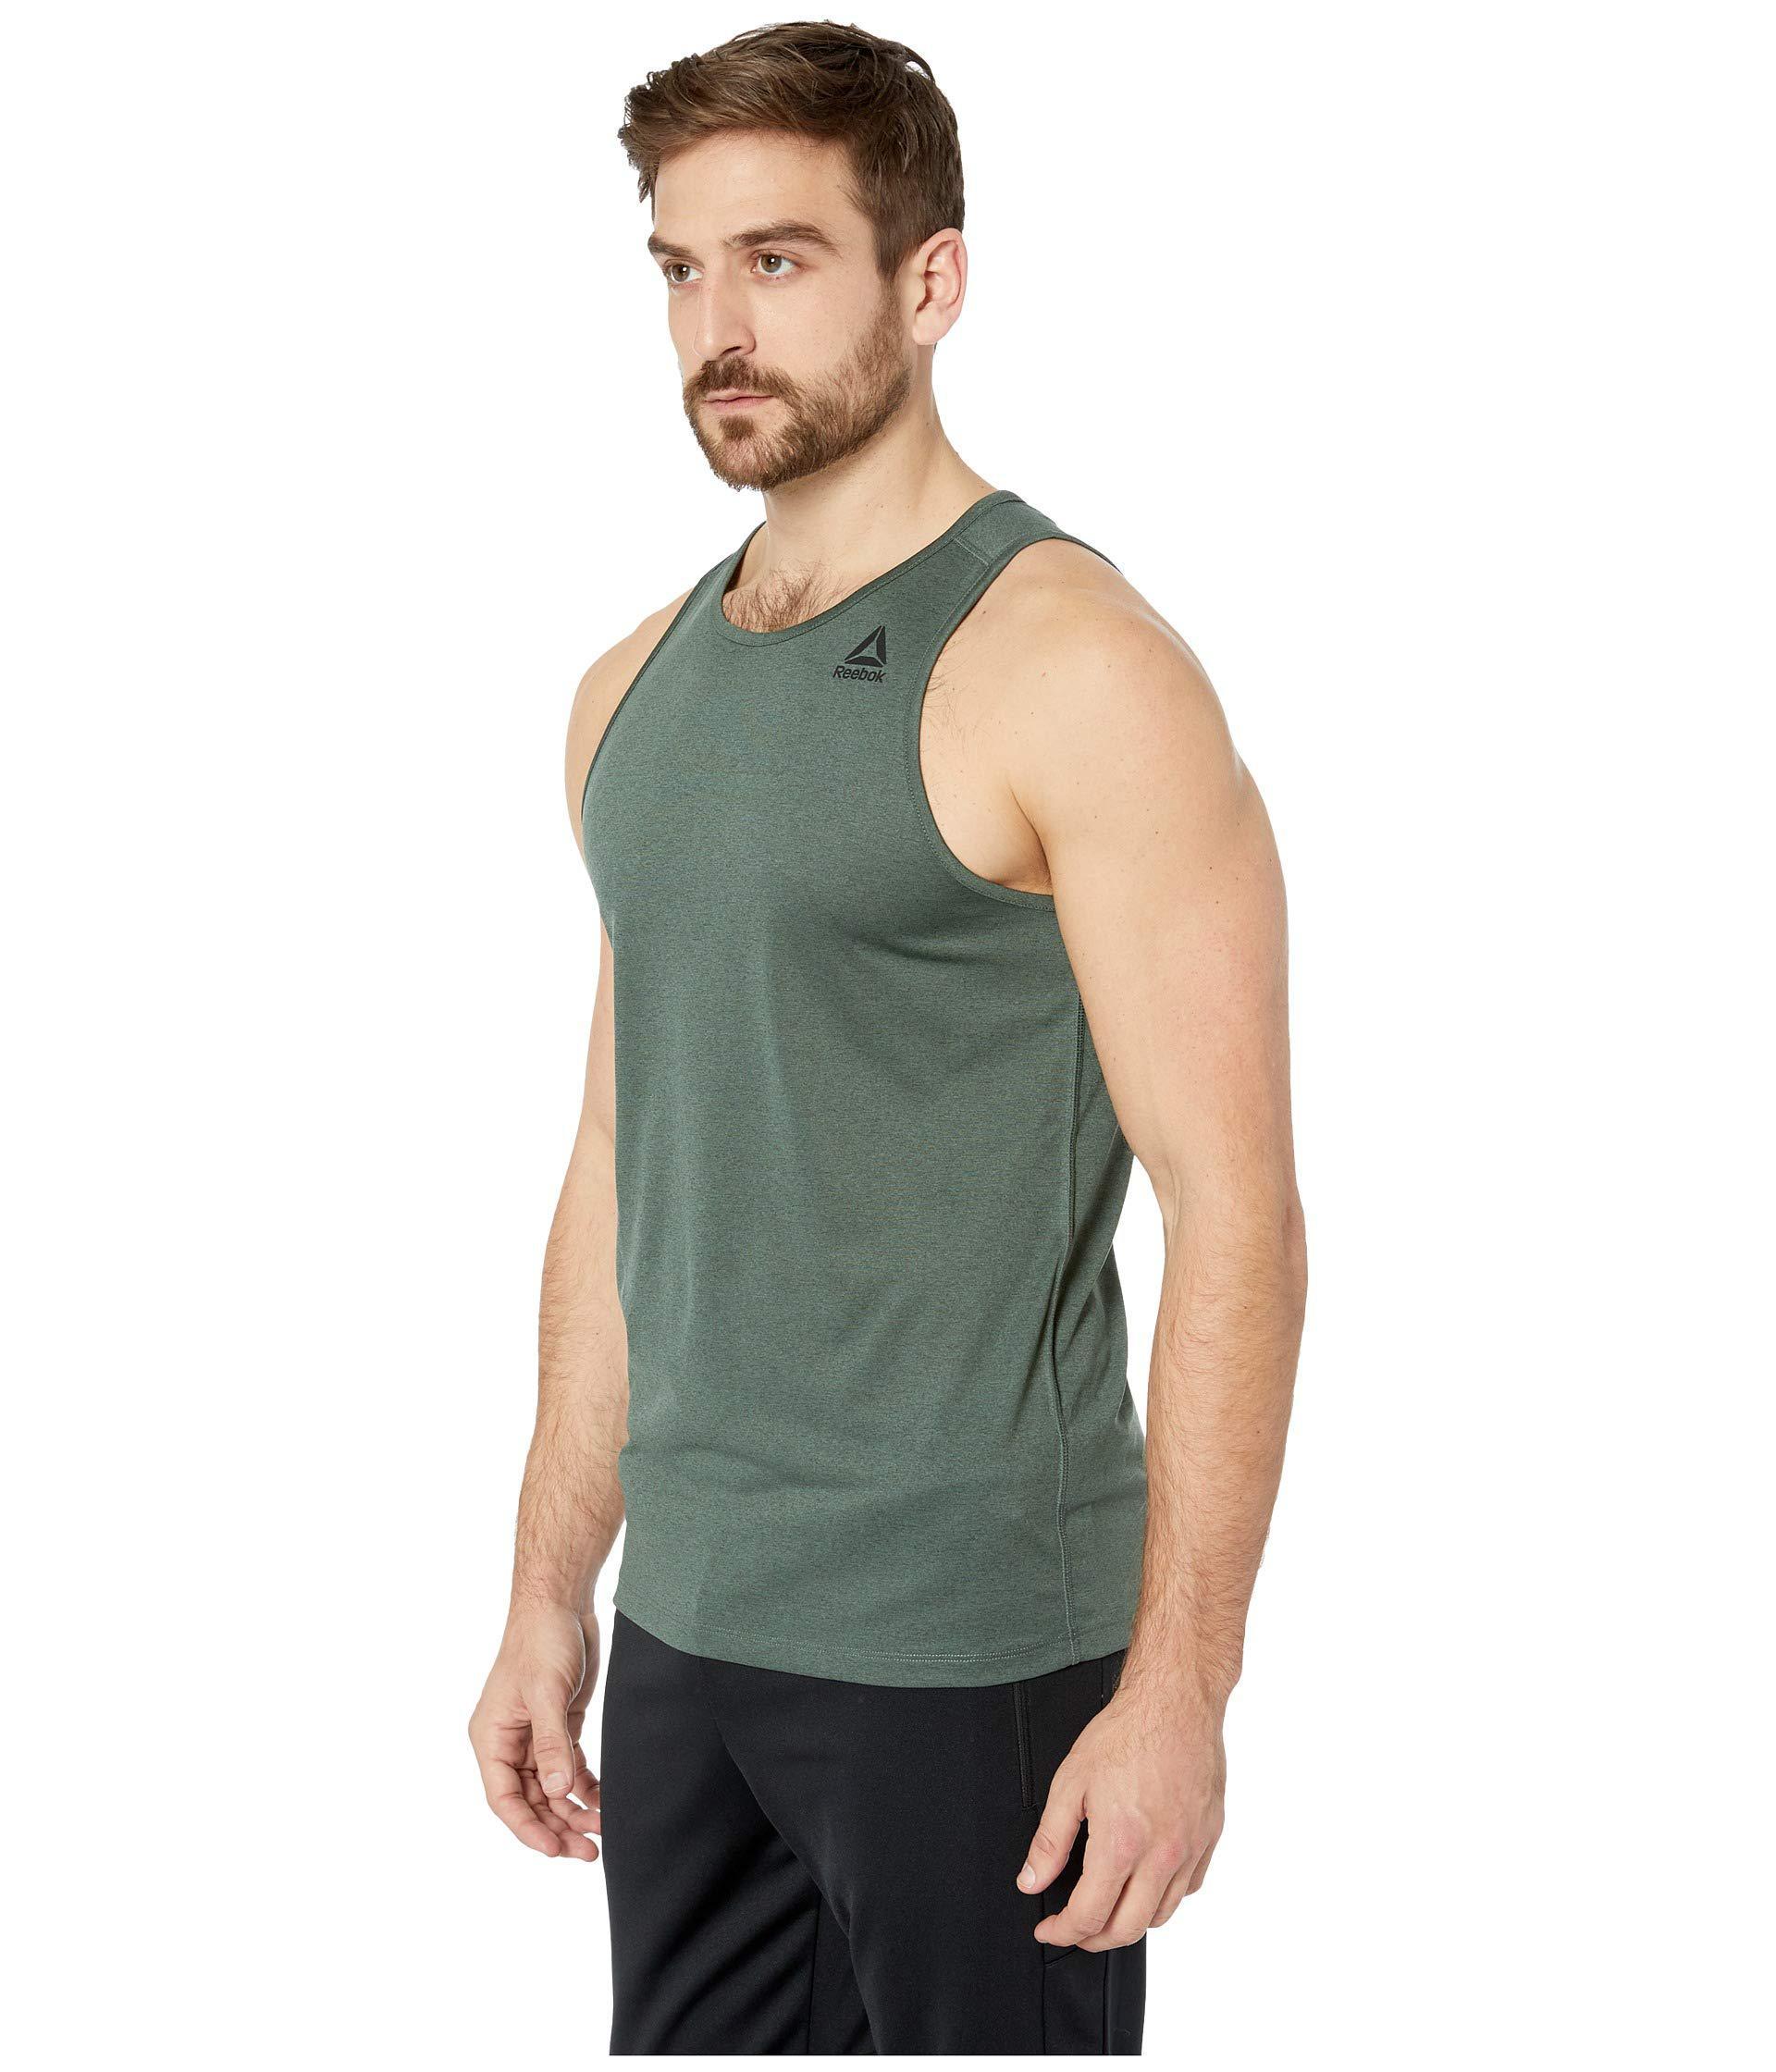 ed21592555f9c3 Lyst - Reebok Melange Sleeveless Tee in Green for Men - Save 6%